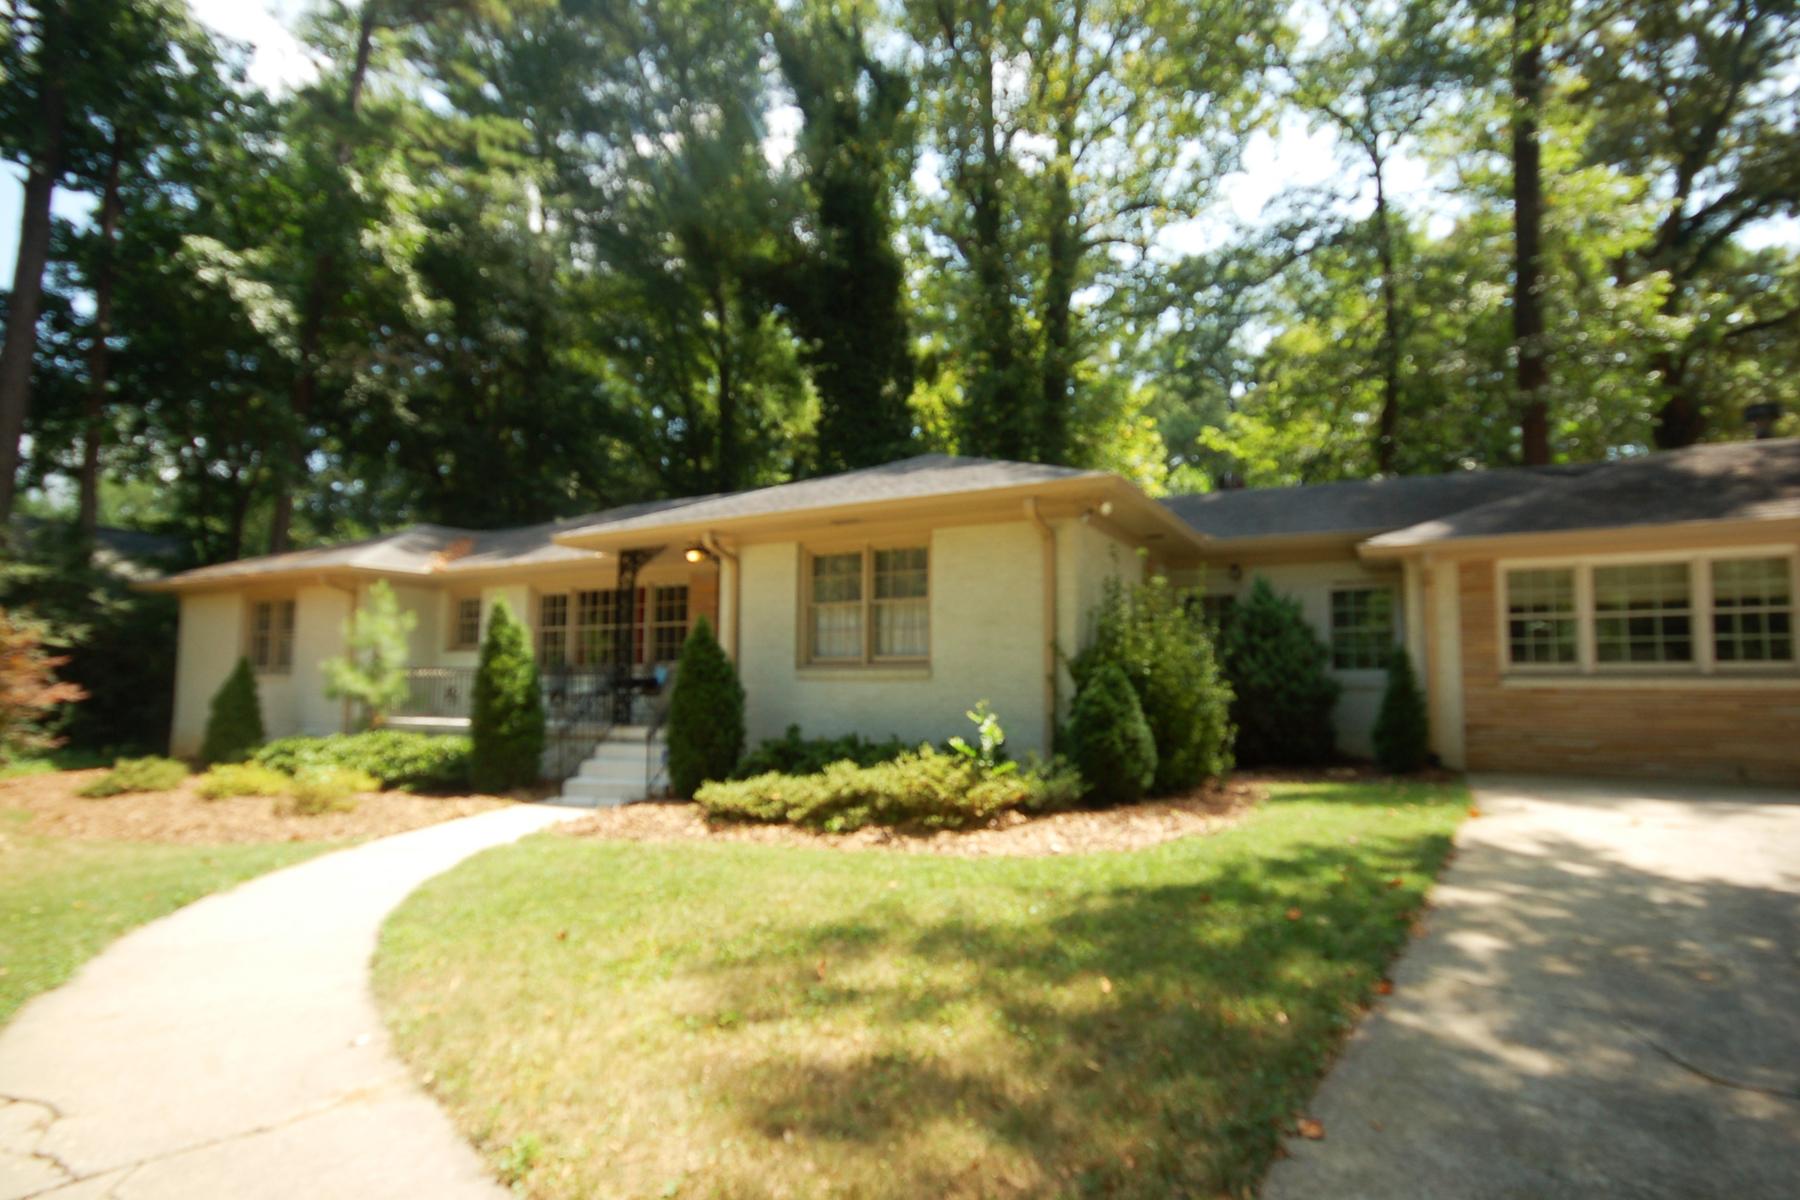 Single Family Home for Sale at Great Opportunity In Buckhead 3851 Wieuca Road Buckhead, Atlanta, Georgia, 30342 United States